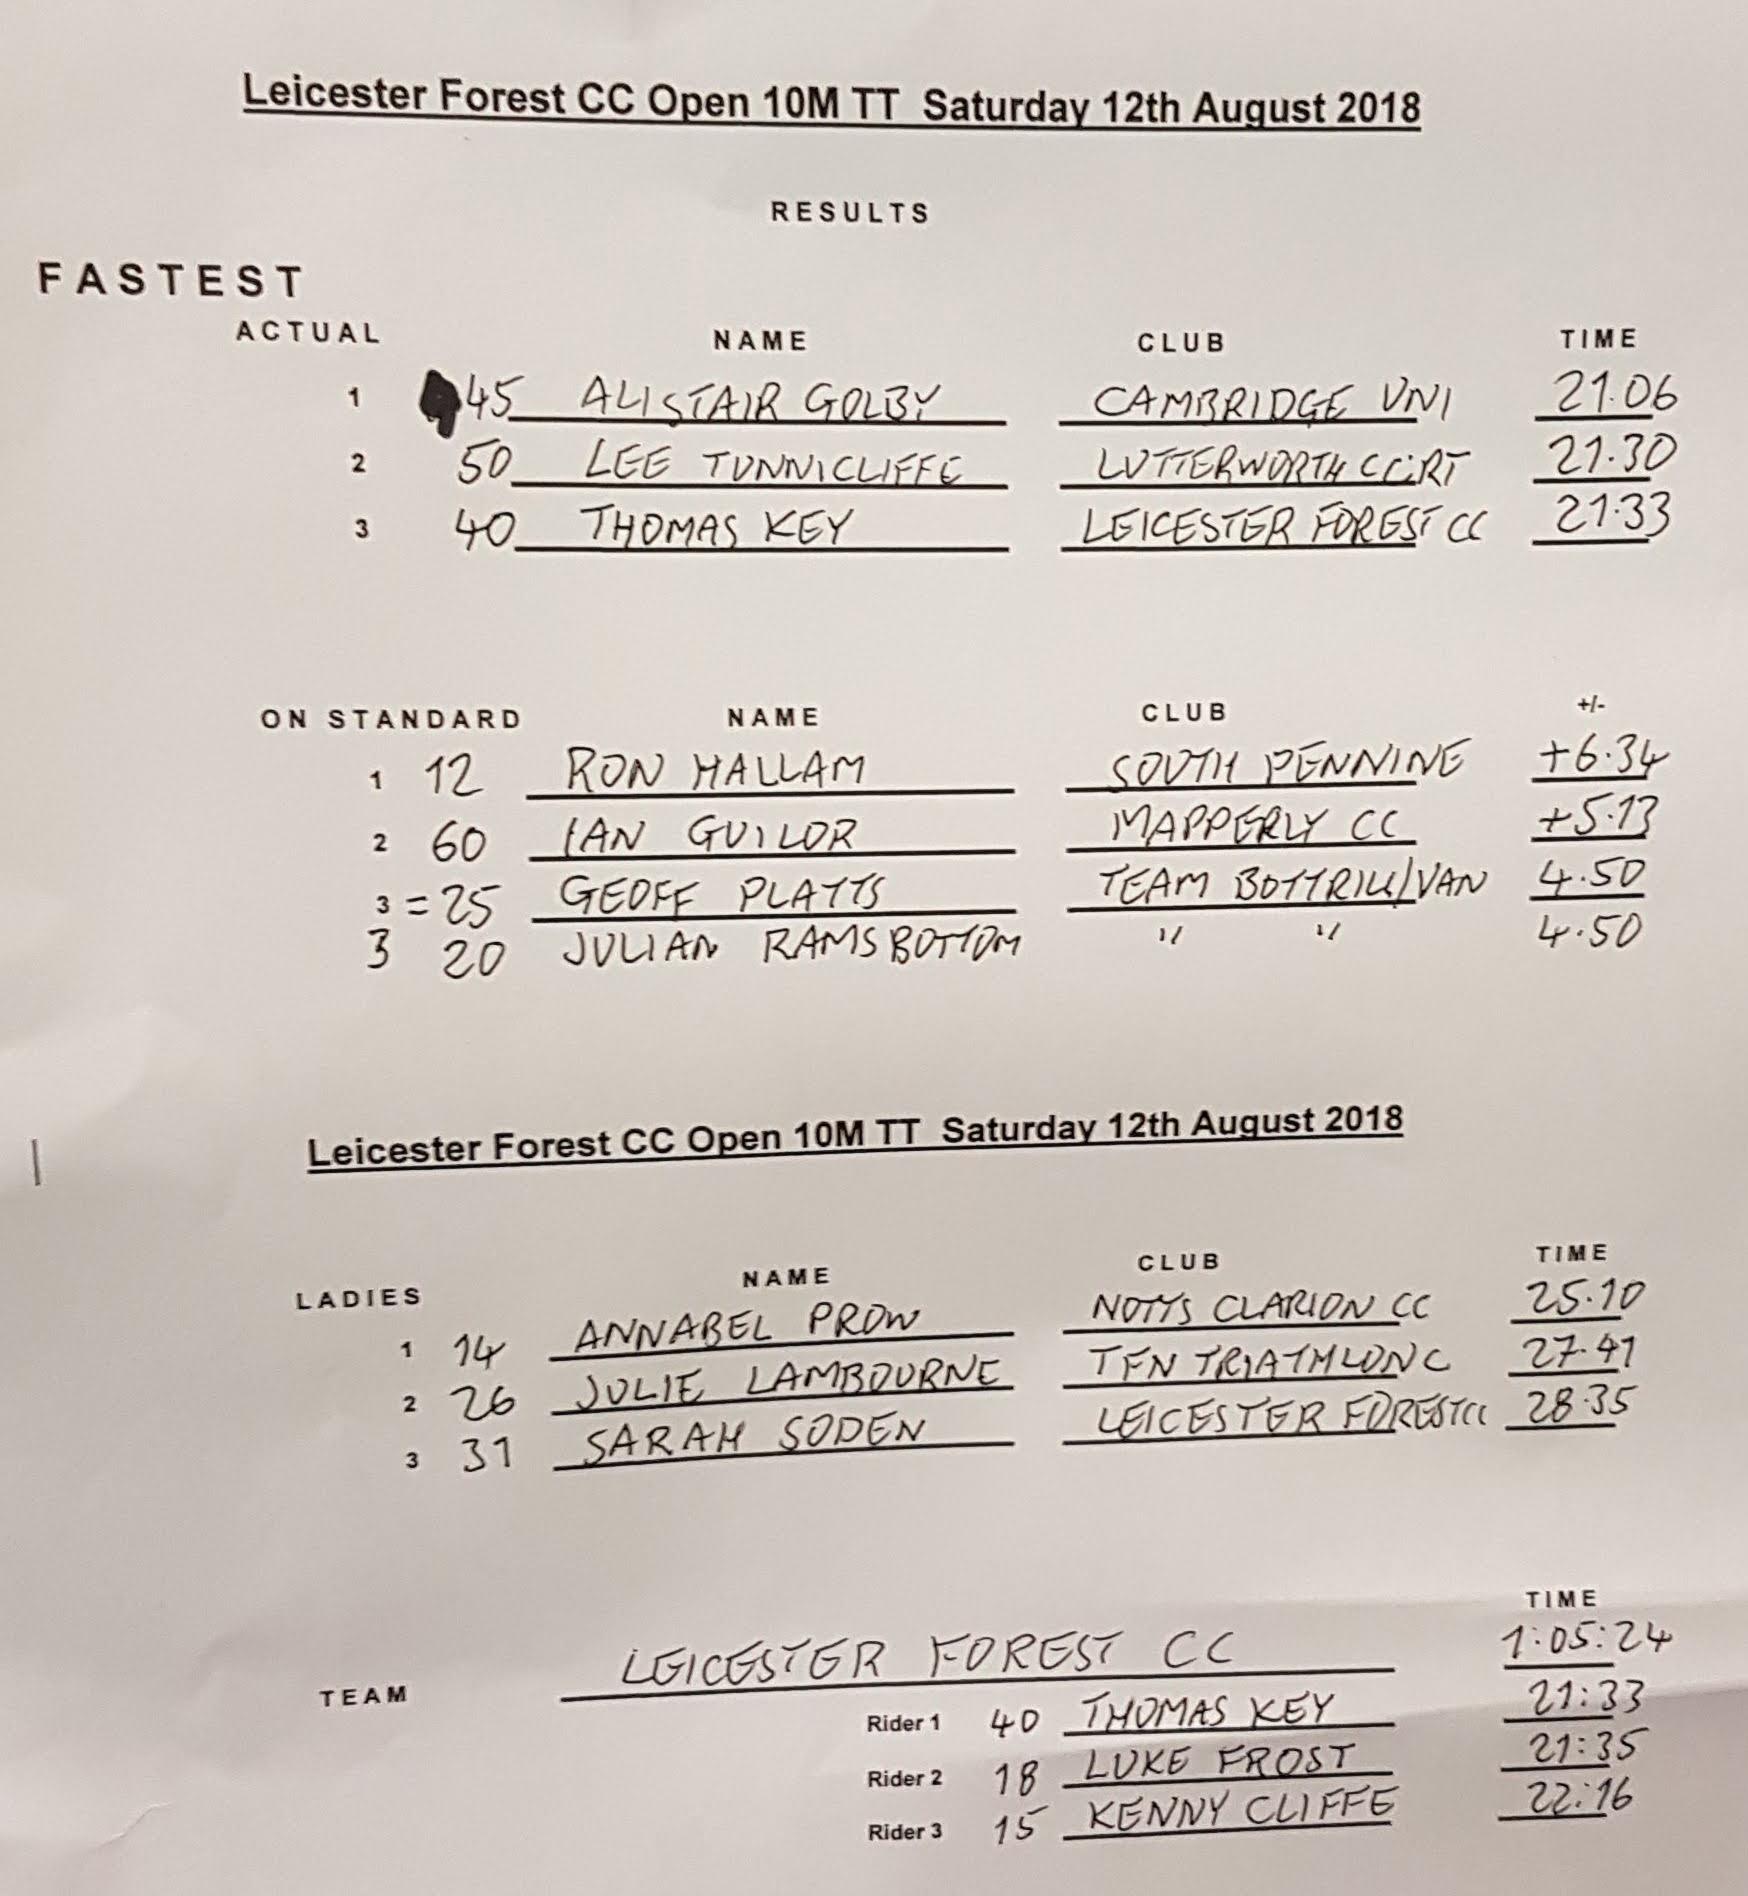 LFCC Provisional 10 TT Results_003.jpg